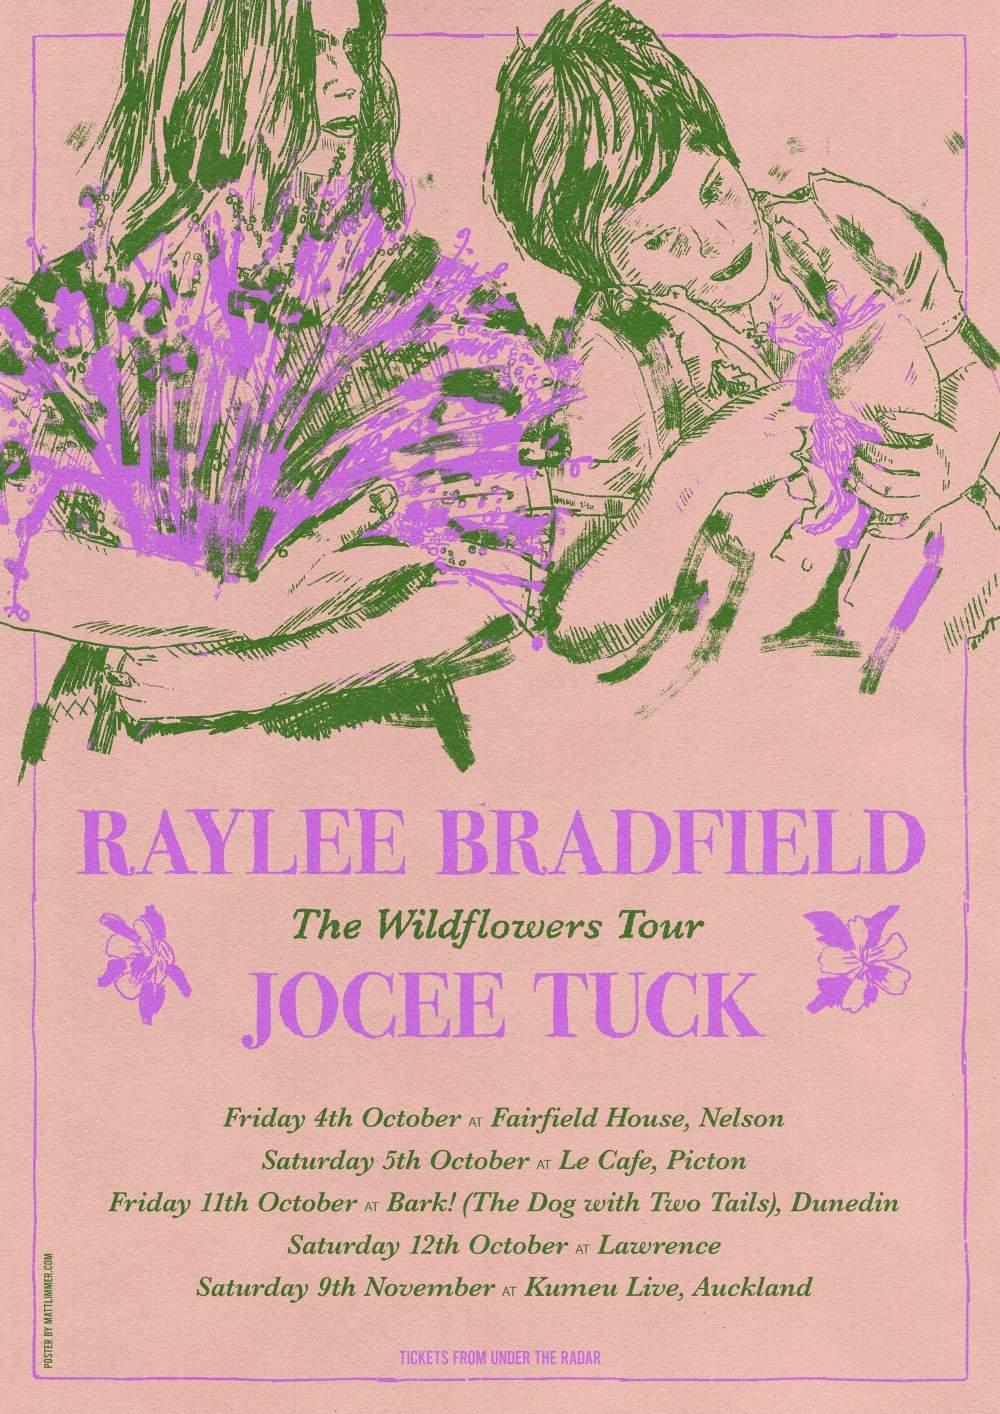 Raylee-Bradfield_Jocee-Tuck-Poster_V1_Facebook_NEW